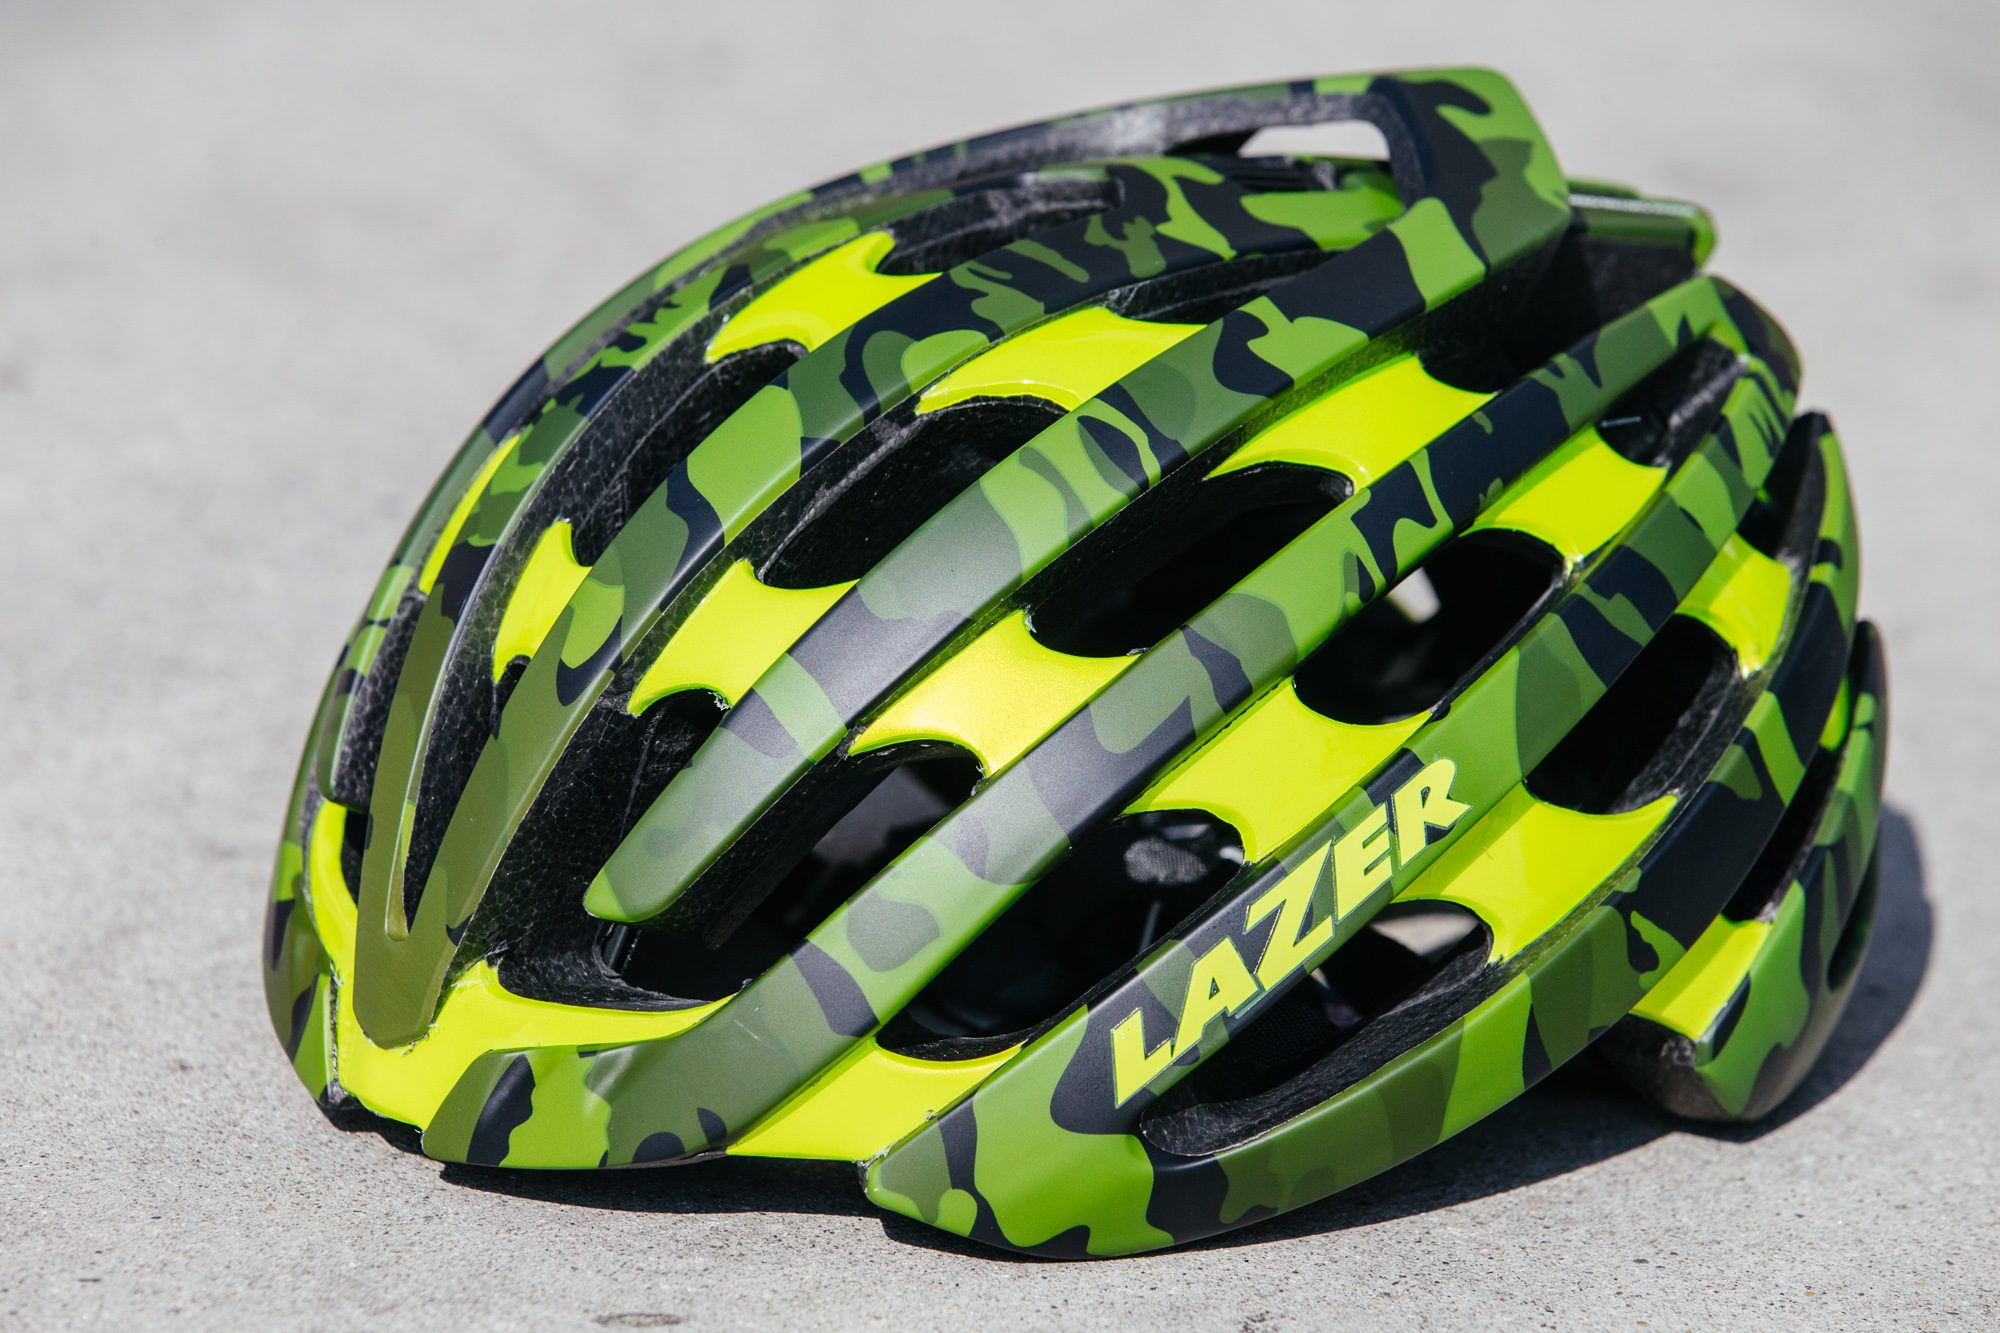 Lazer Z1 MIPS Lifebeam Helmet | Competitive Cyclist